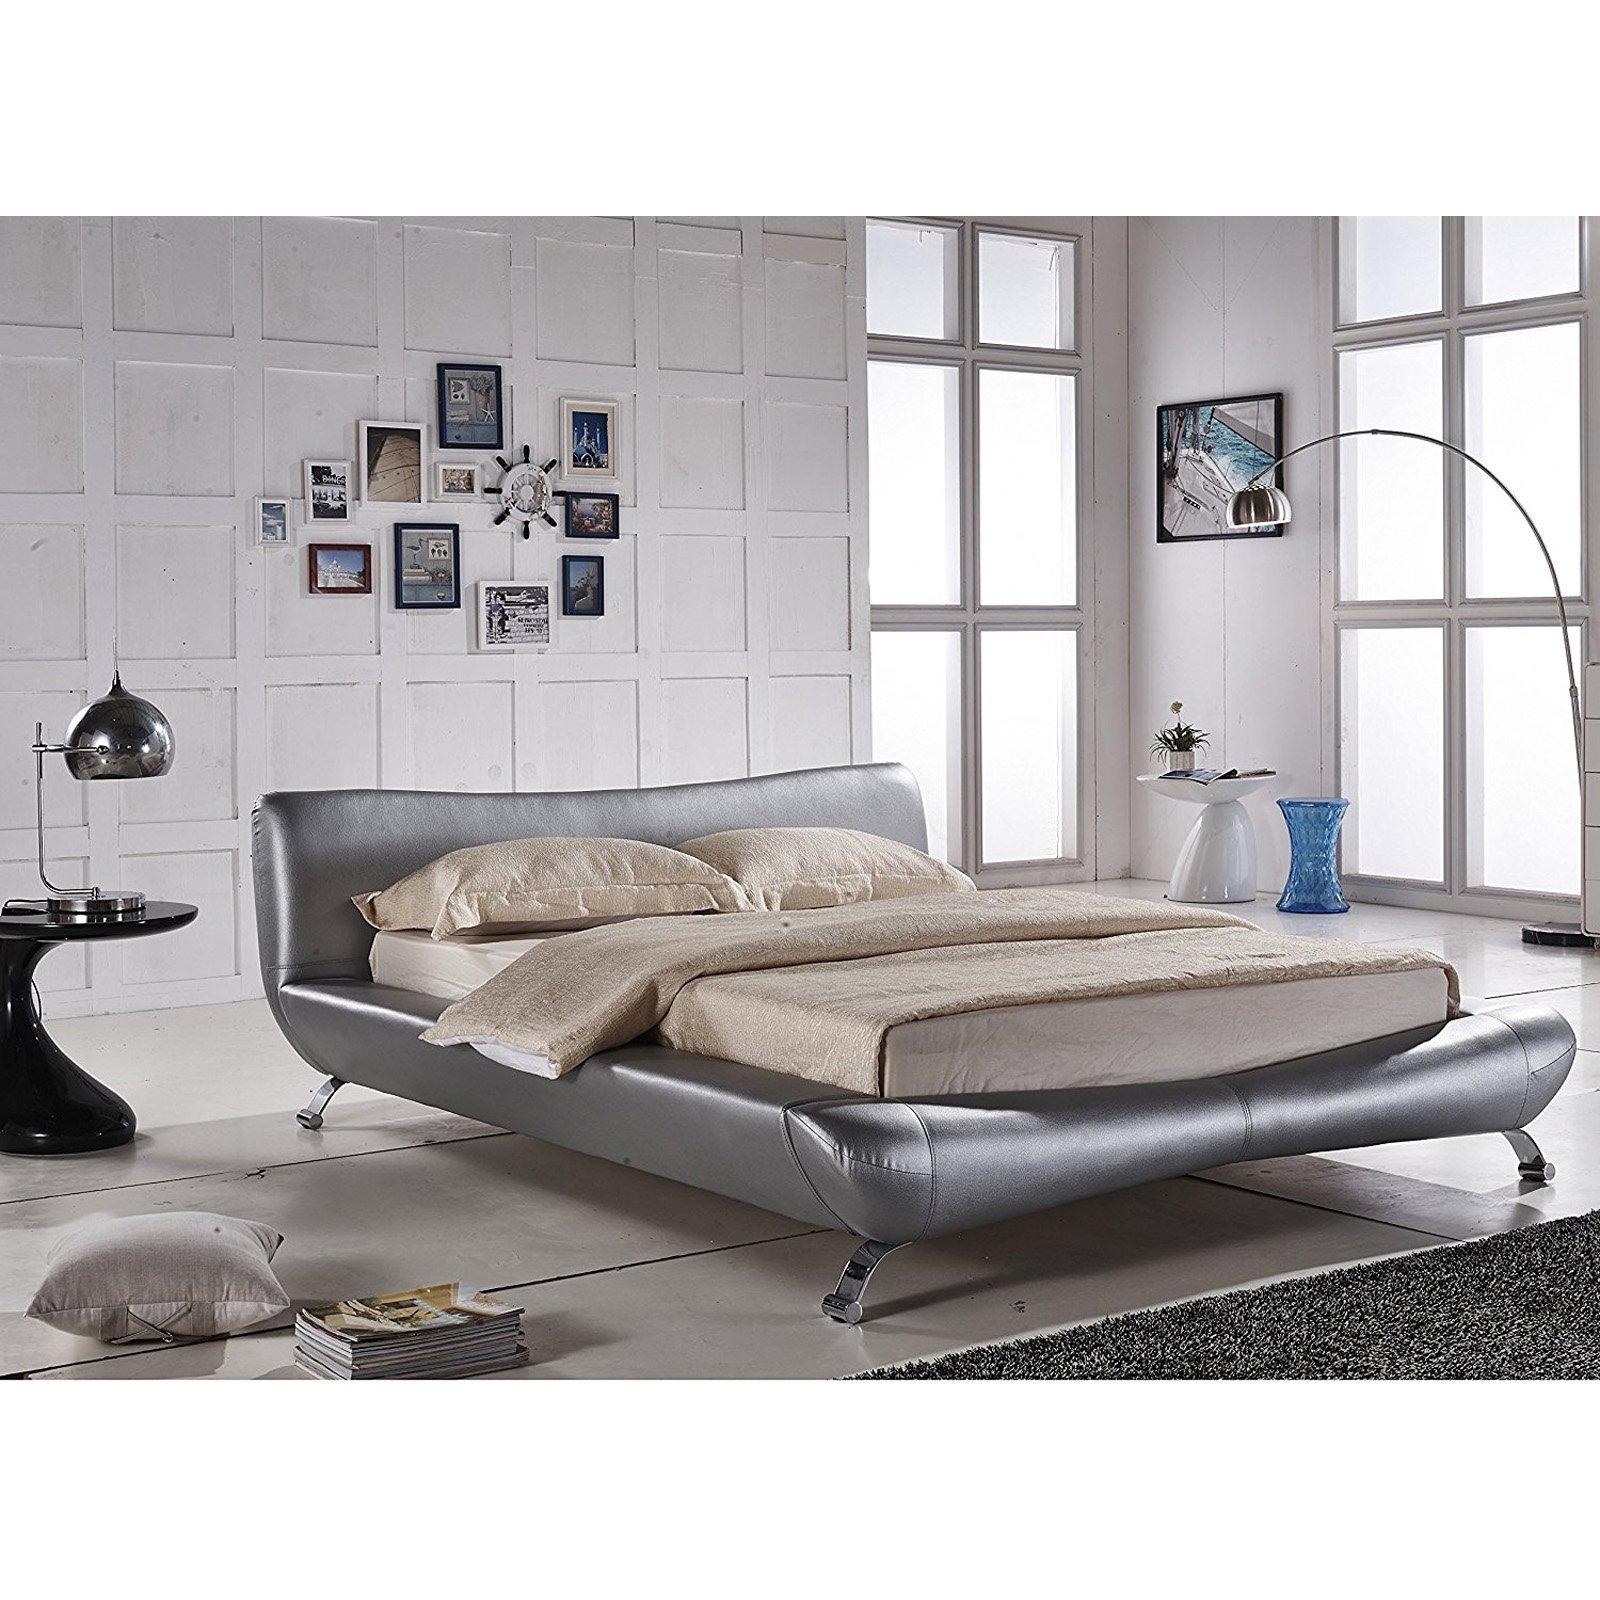 U.S. Pride Furniture Joyce Faux Leather Platform Bed